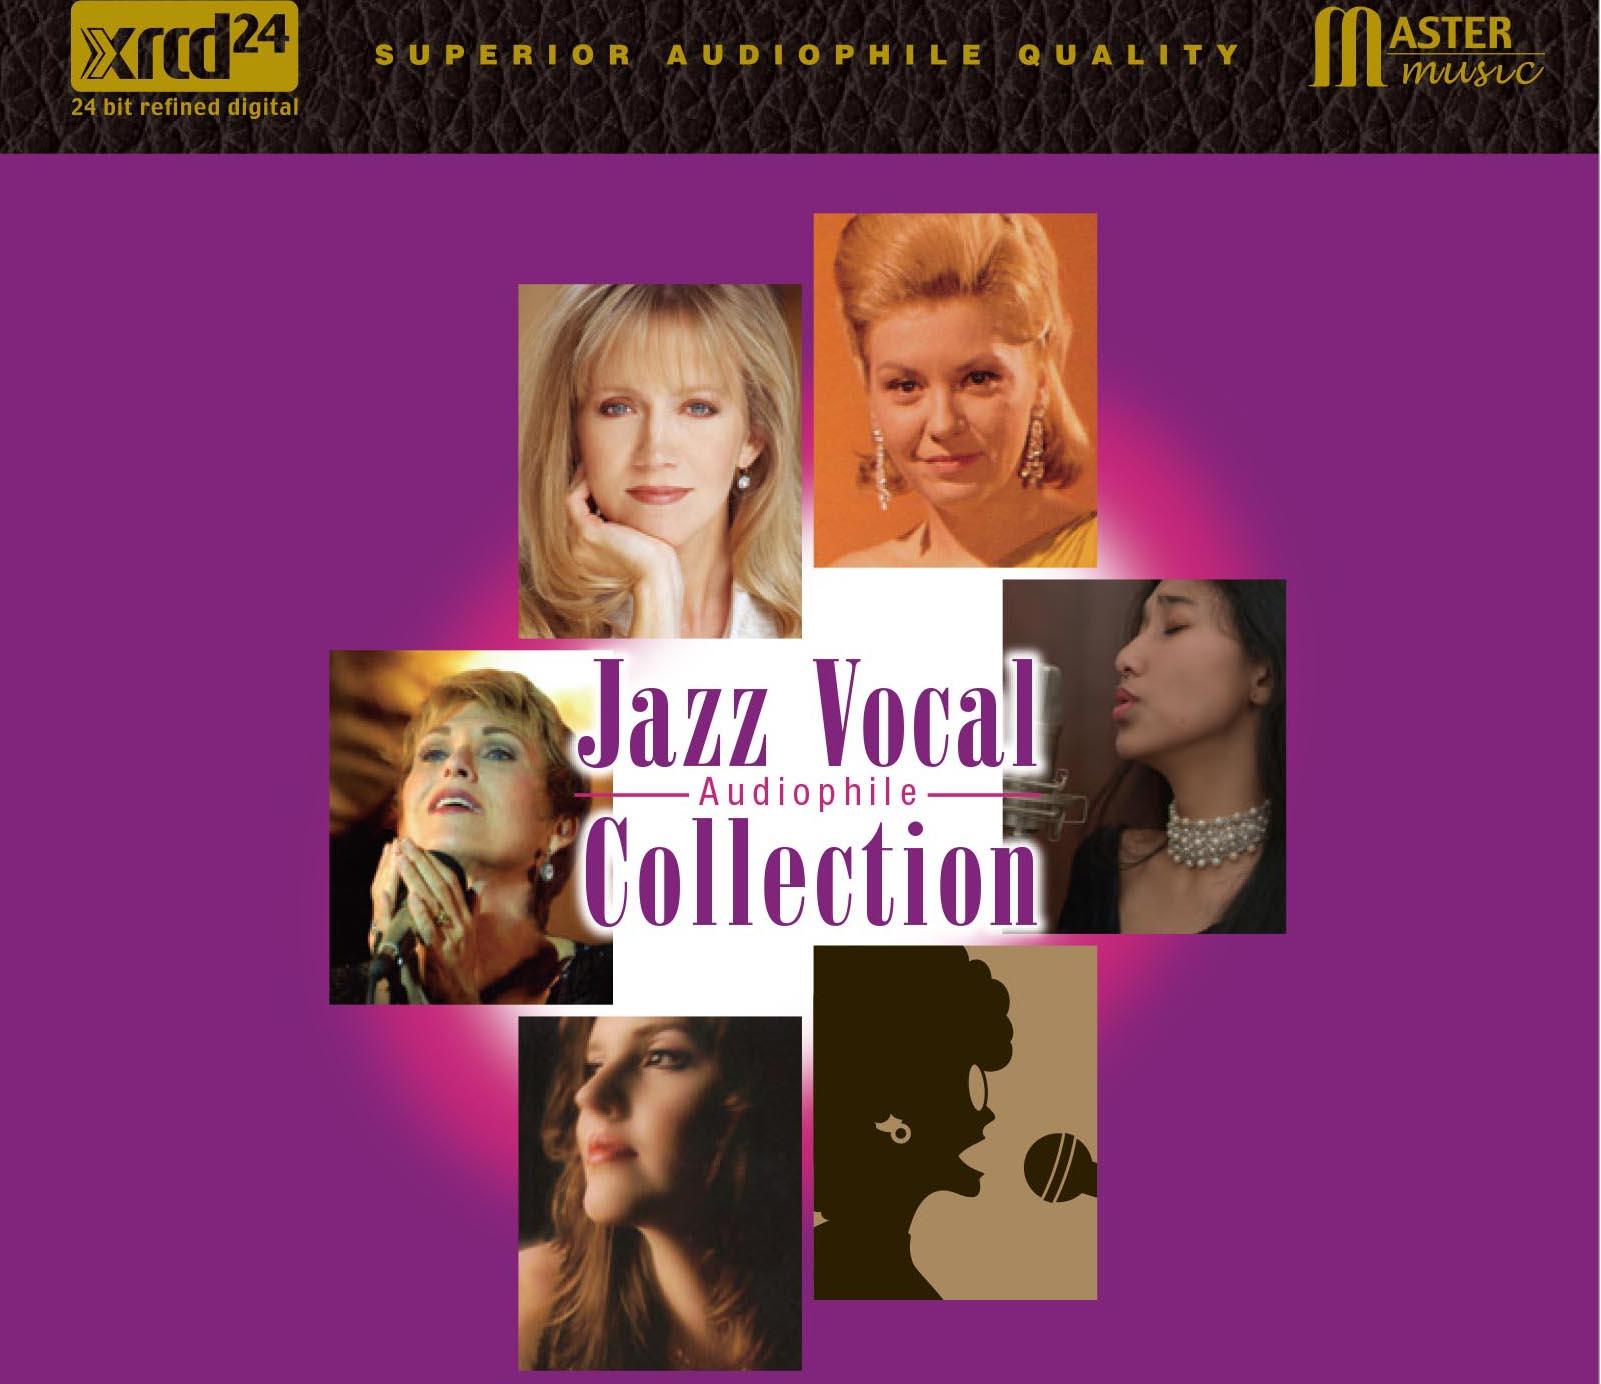 Jazz Vocal Collection/6 artists including Amanda McBroom